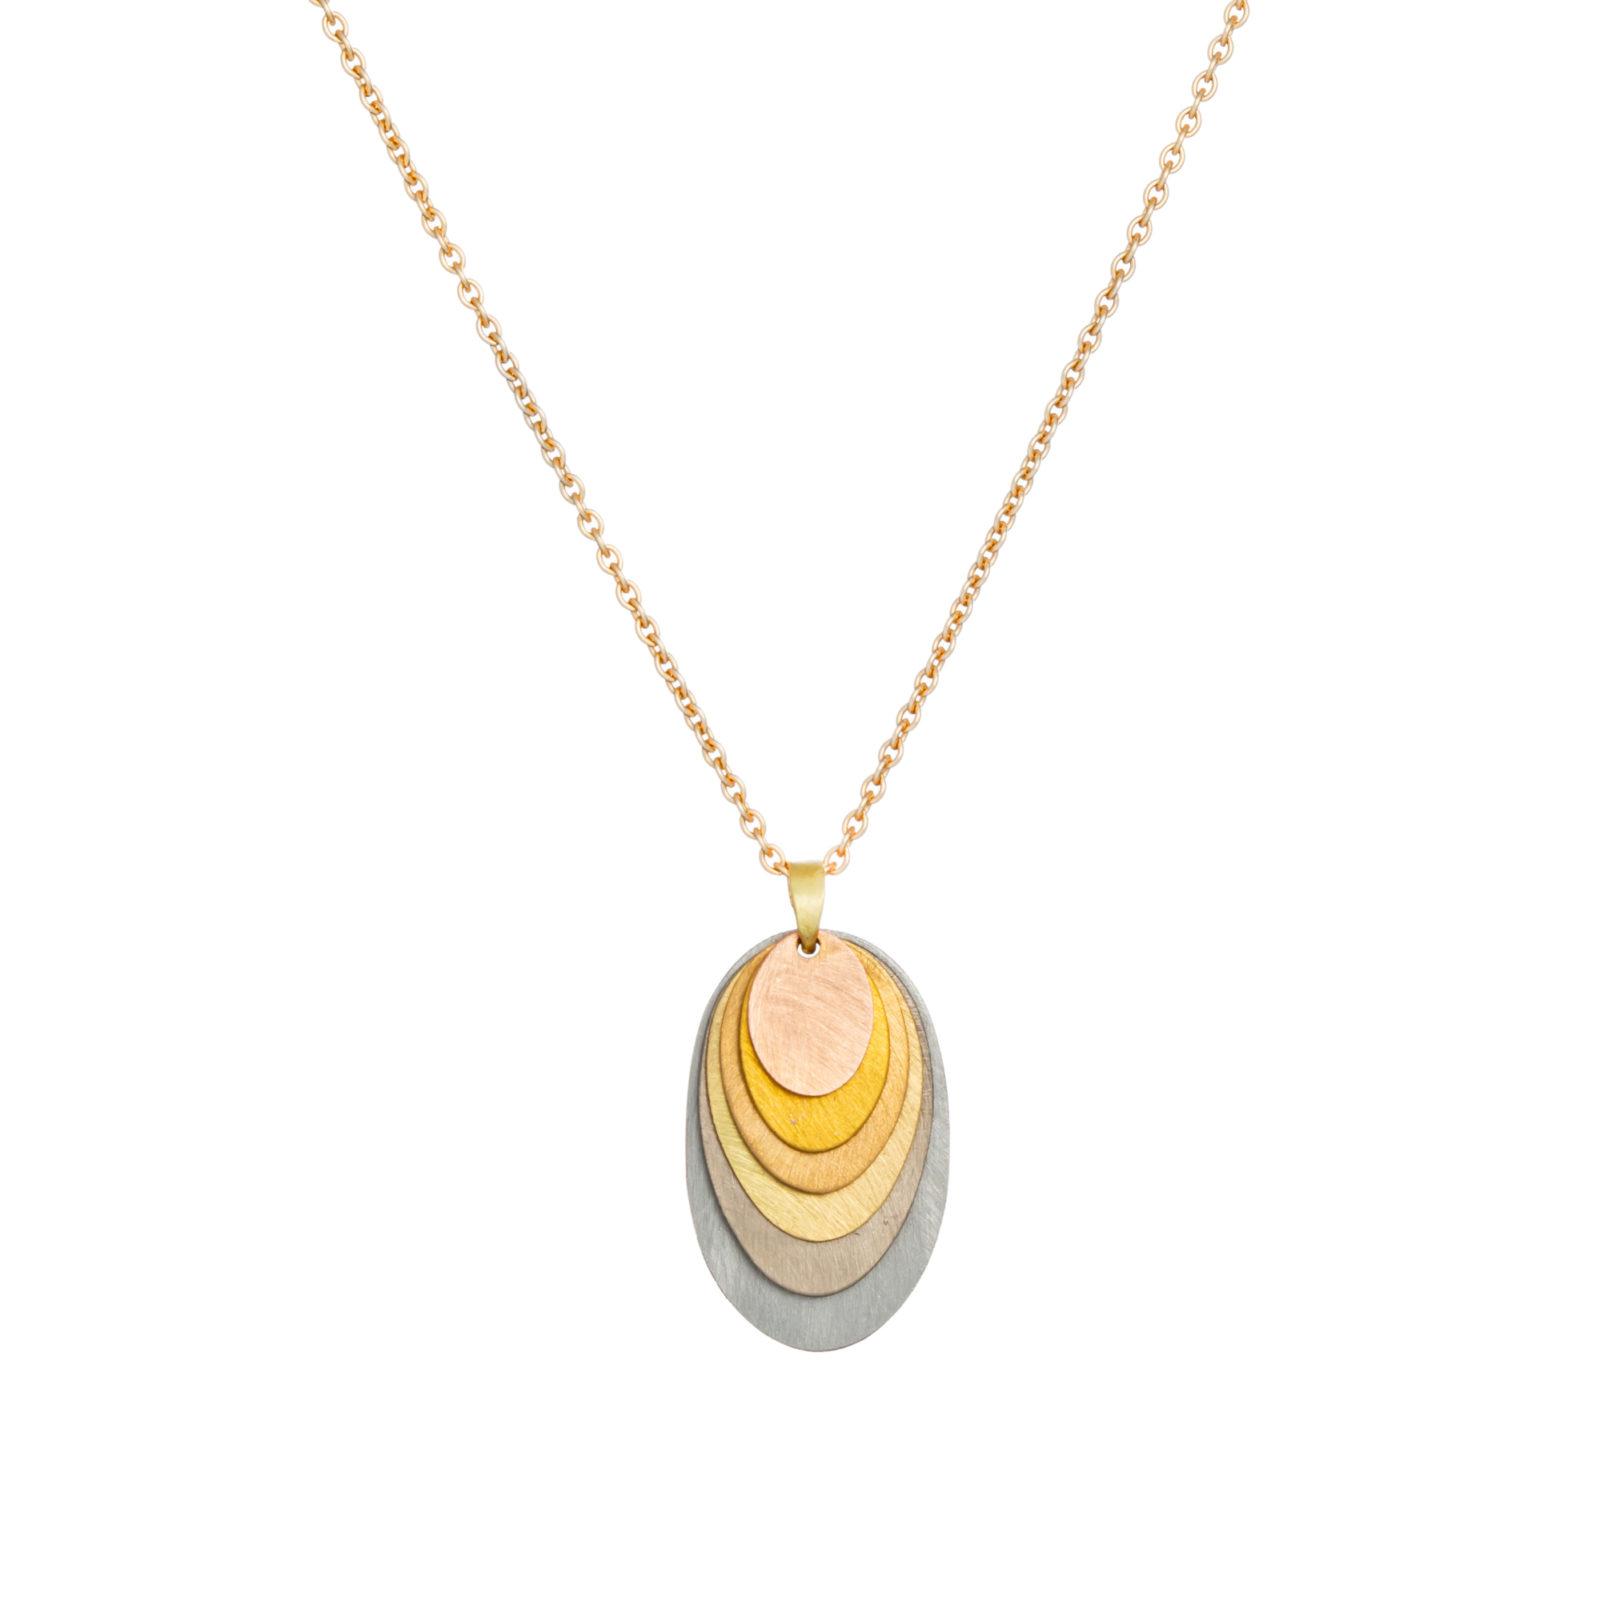 Sia Taylor FN7 RAIN Rainbow Gold Necklace WB